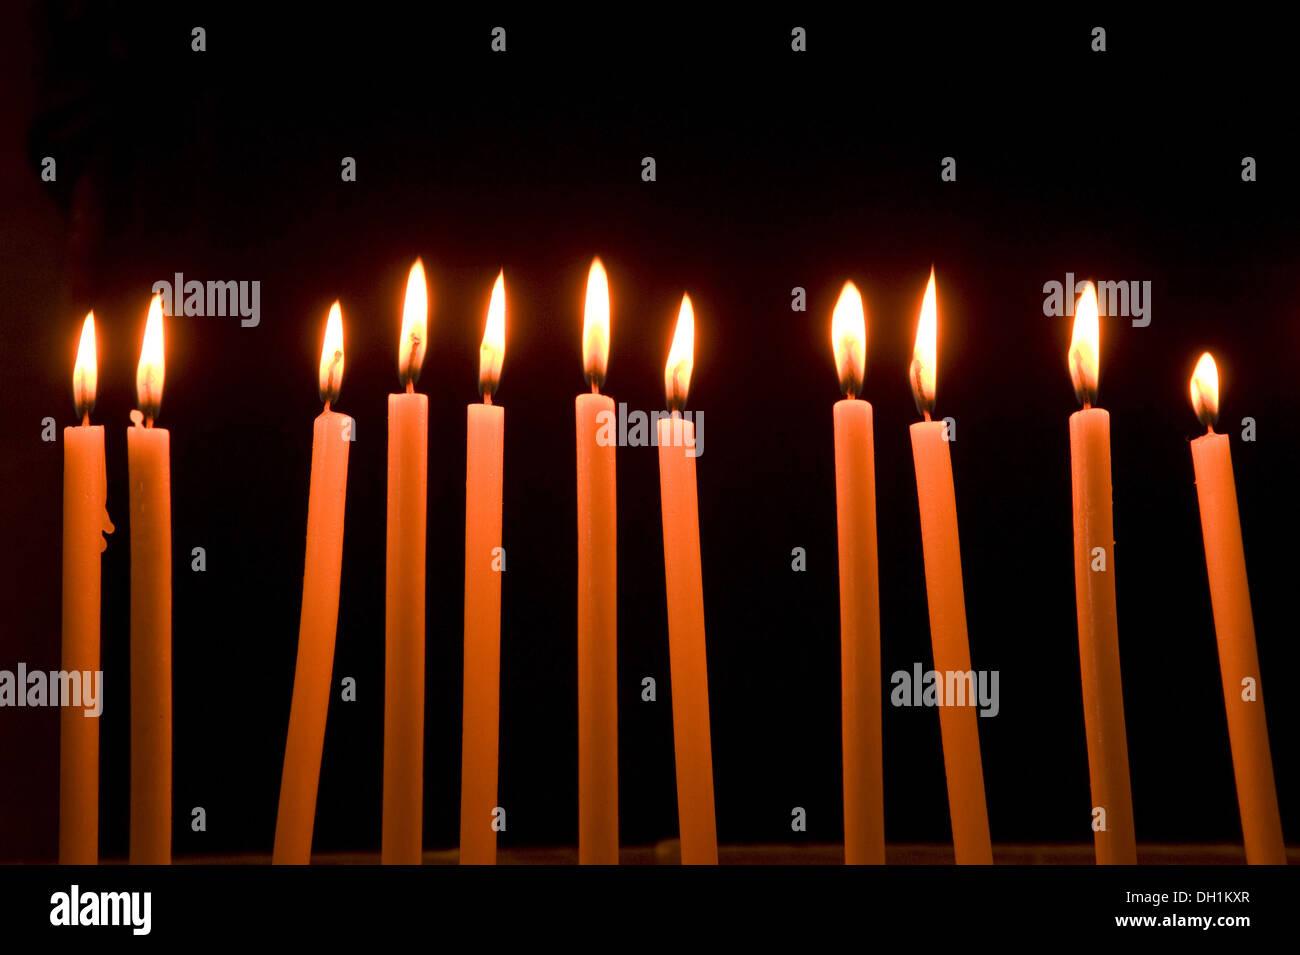 eleven burning candles - Stock Image